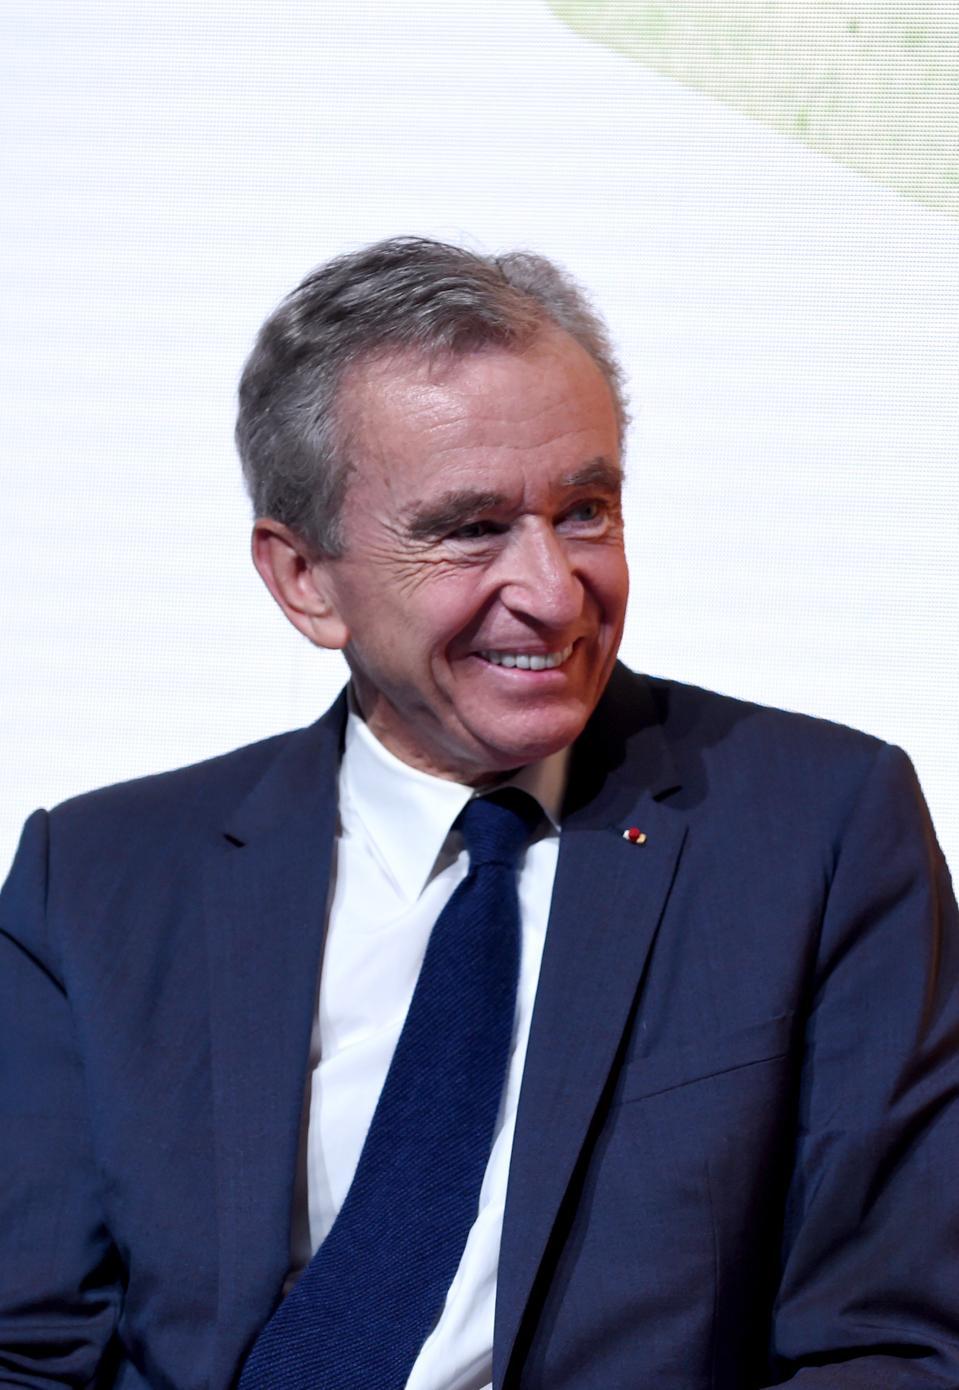 FRANCE-ECONOMY-ENVIRONMENT-LVMH